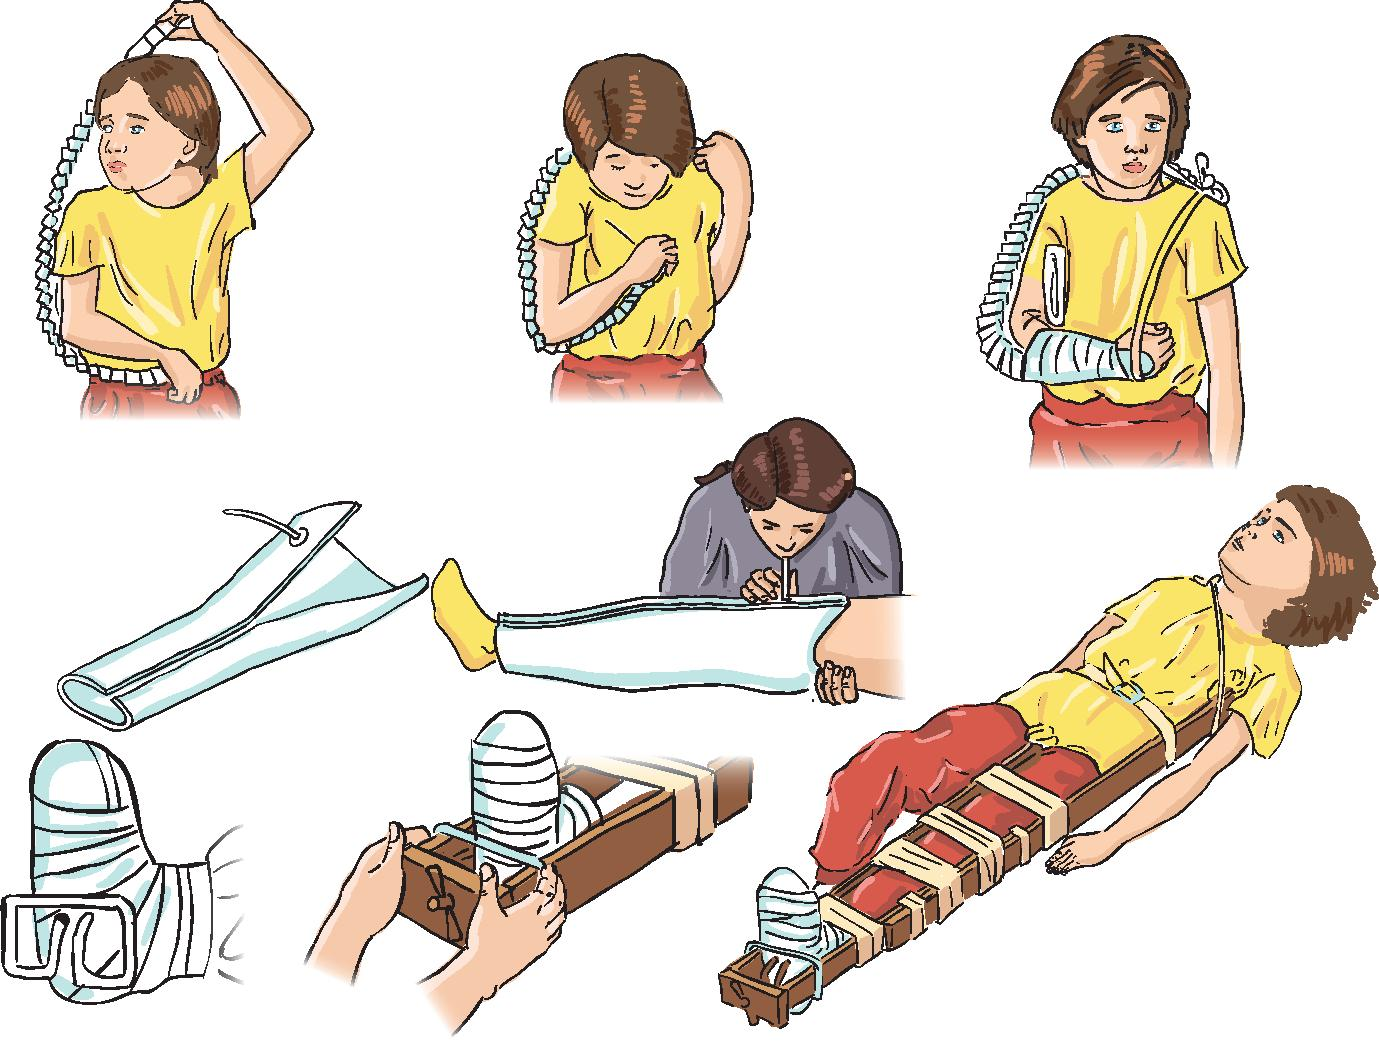 обеспечение неподвижности конечности